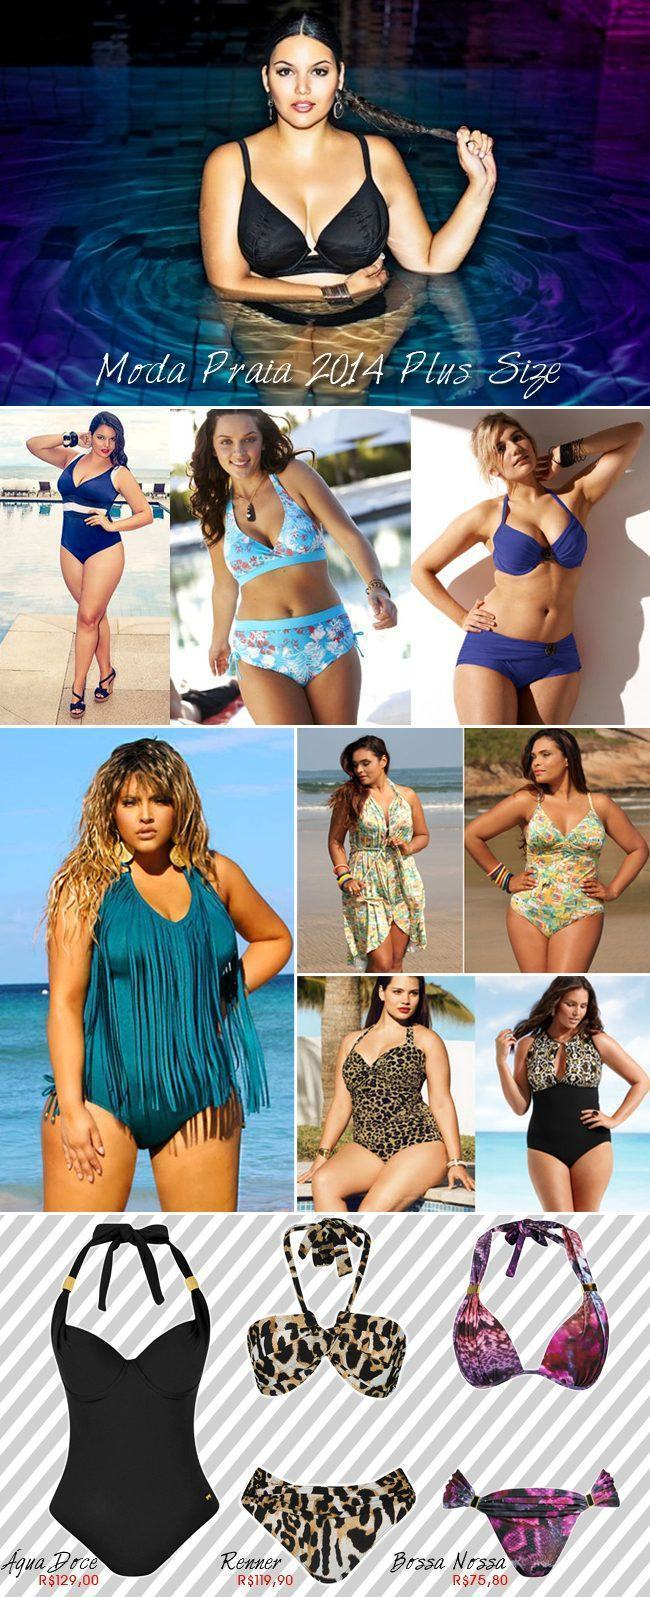 Moda praia 2014 Plus Size copy